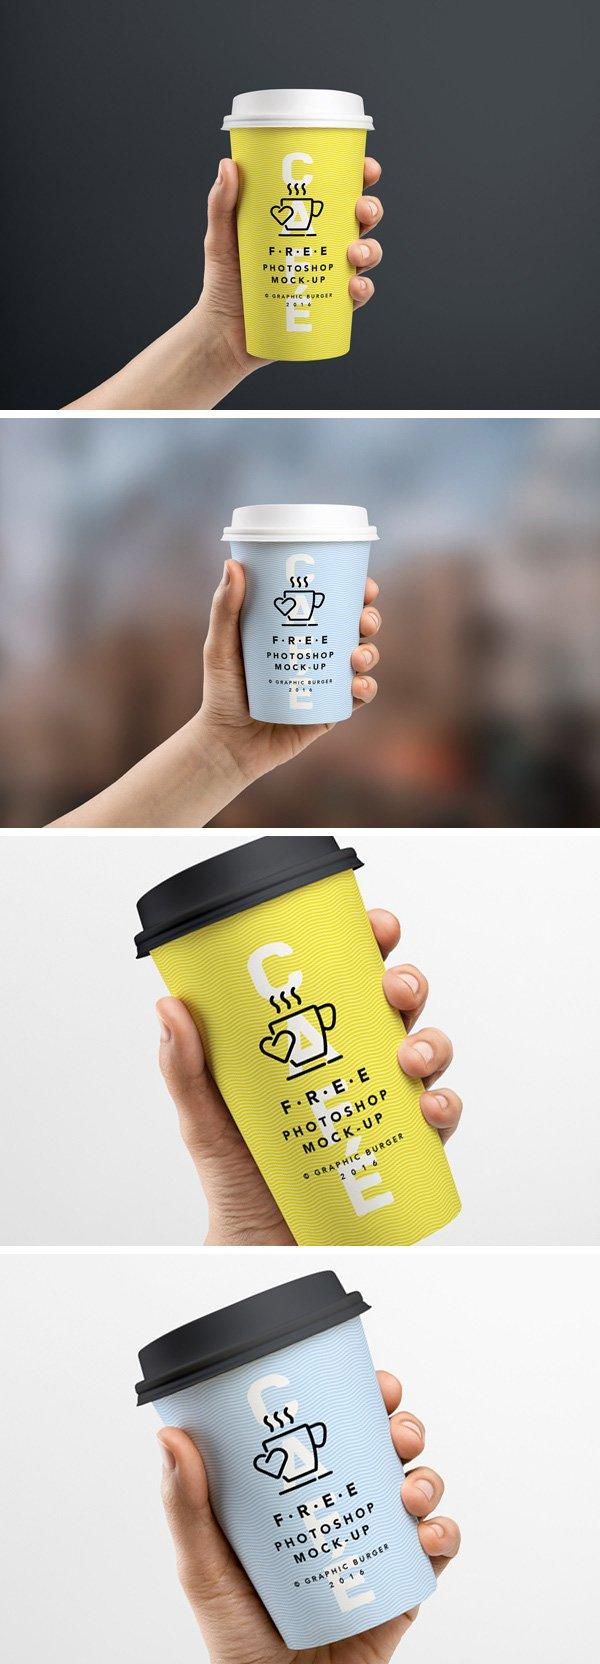 Taza de café en maqueta de mano